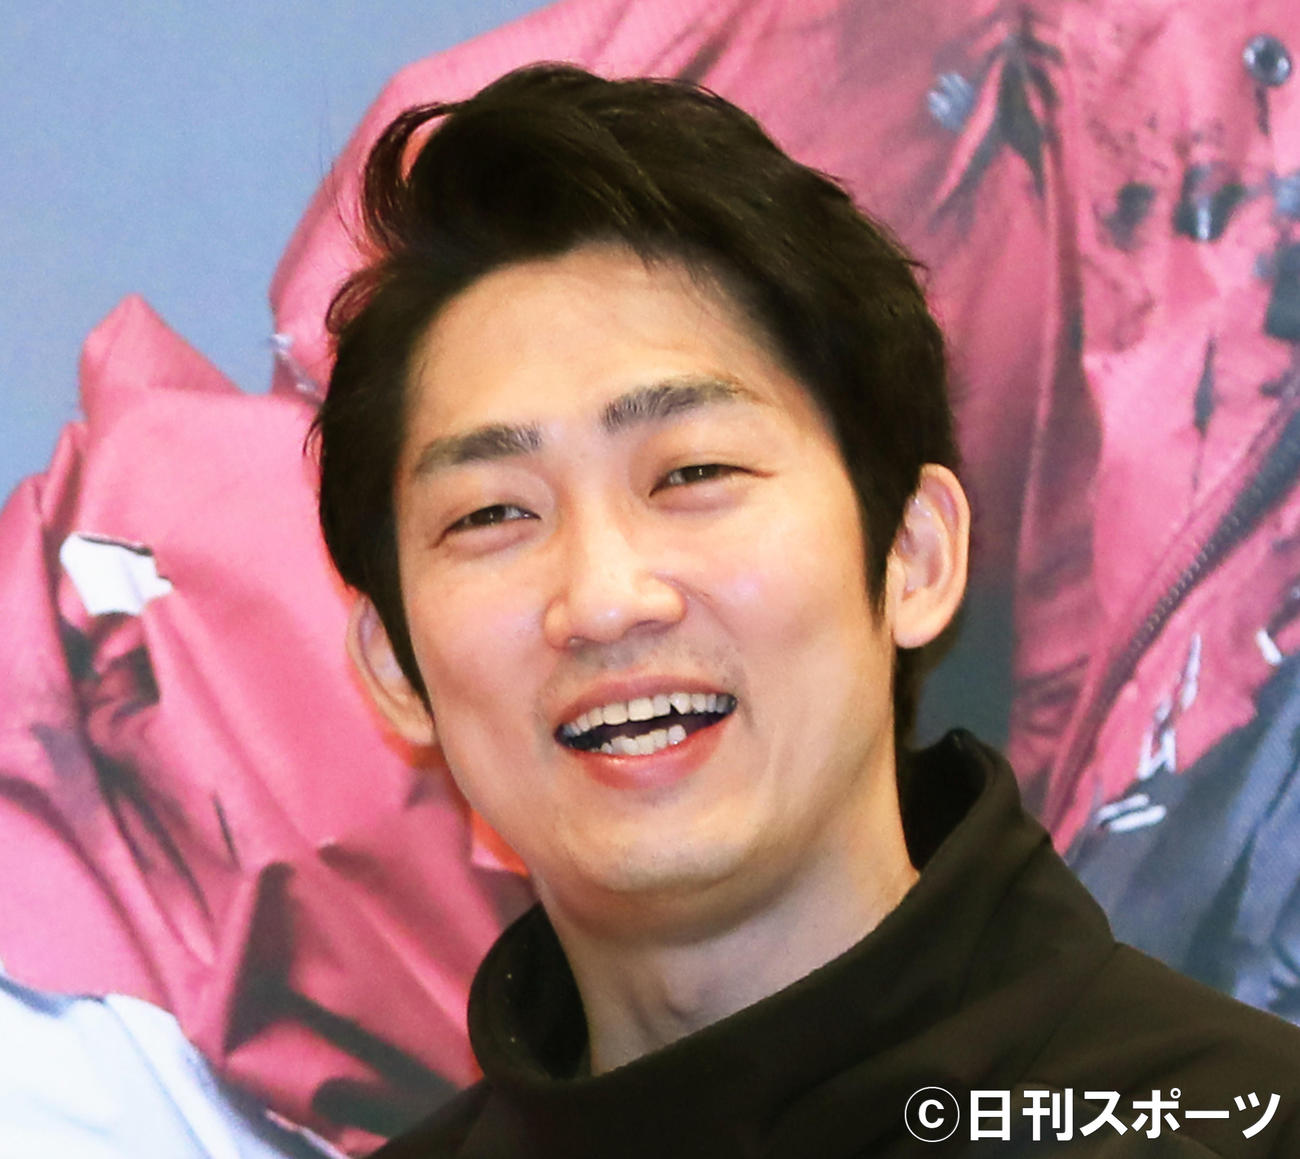 NONSTYLE石田明(2020年1月14日撮影)